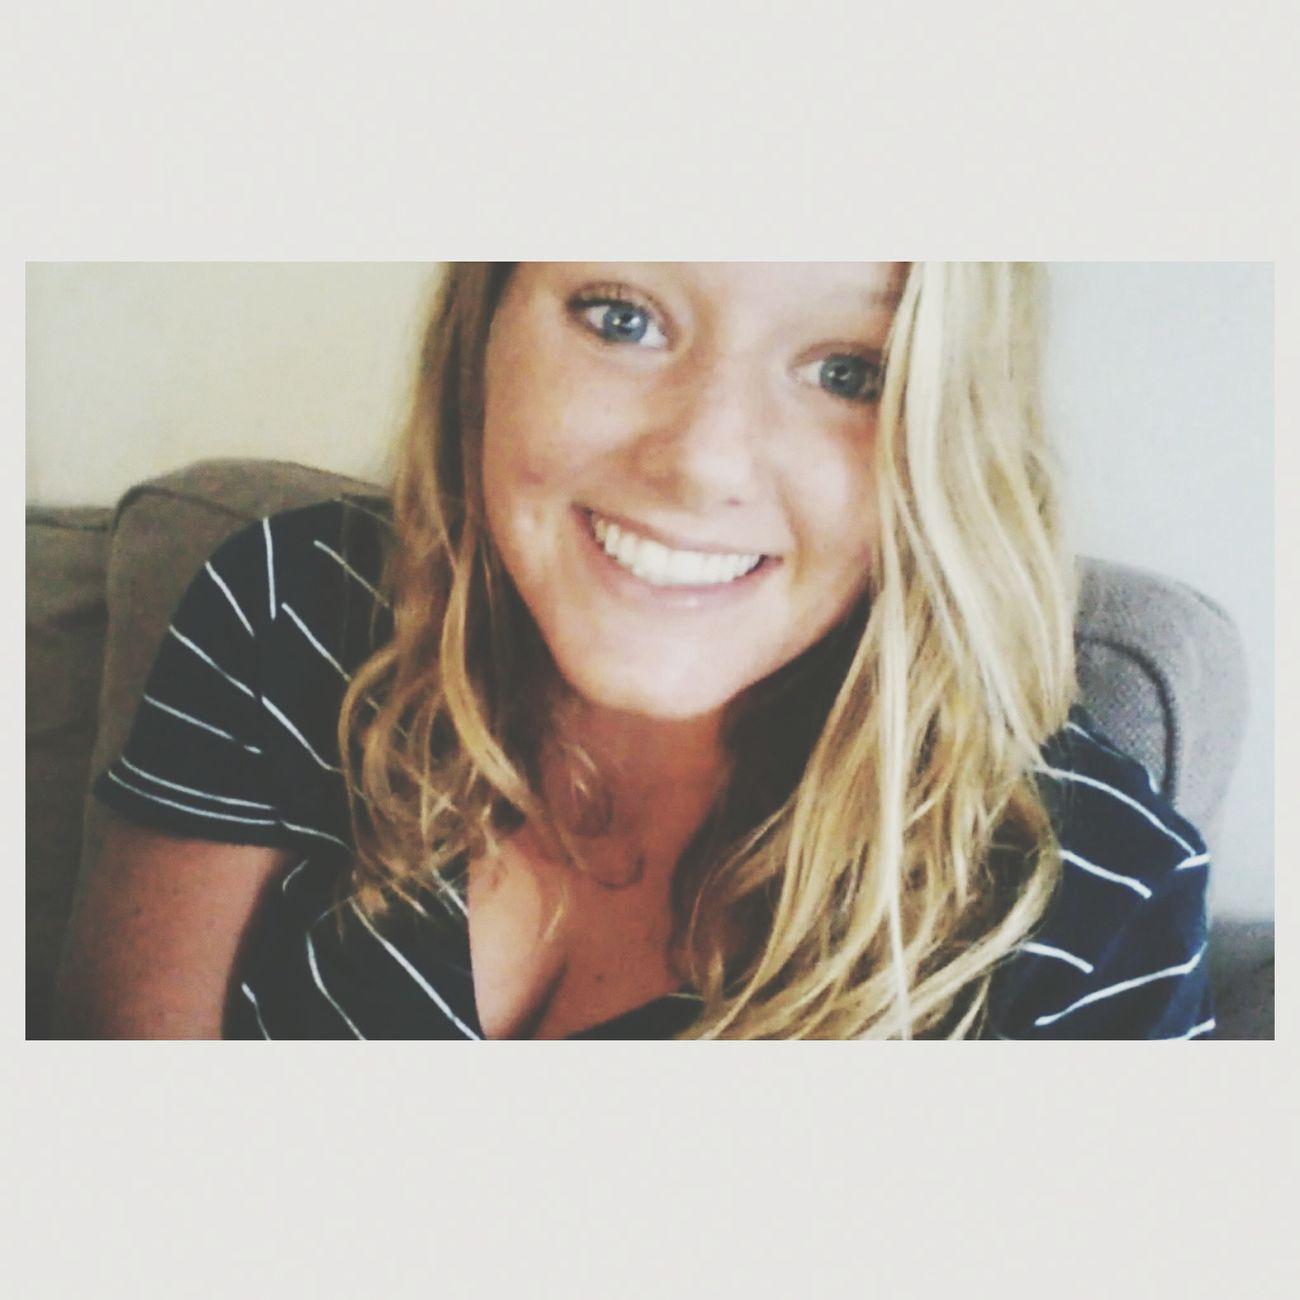 No love allowed. ❌ Selfie